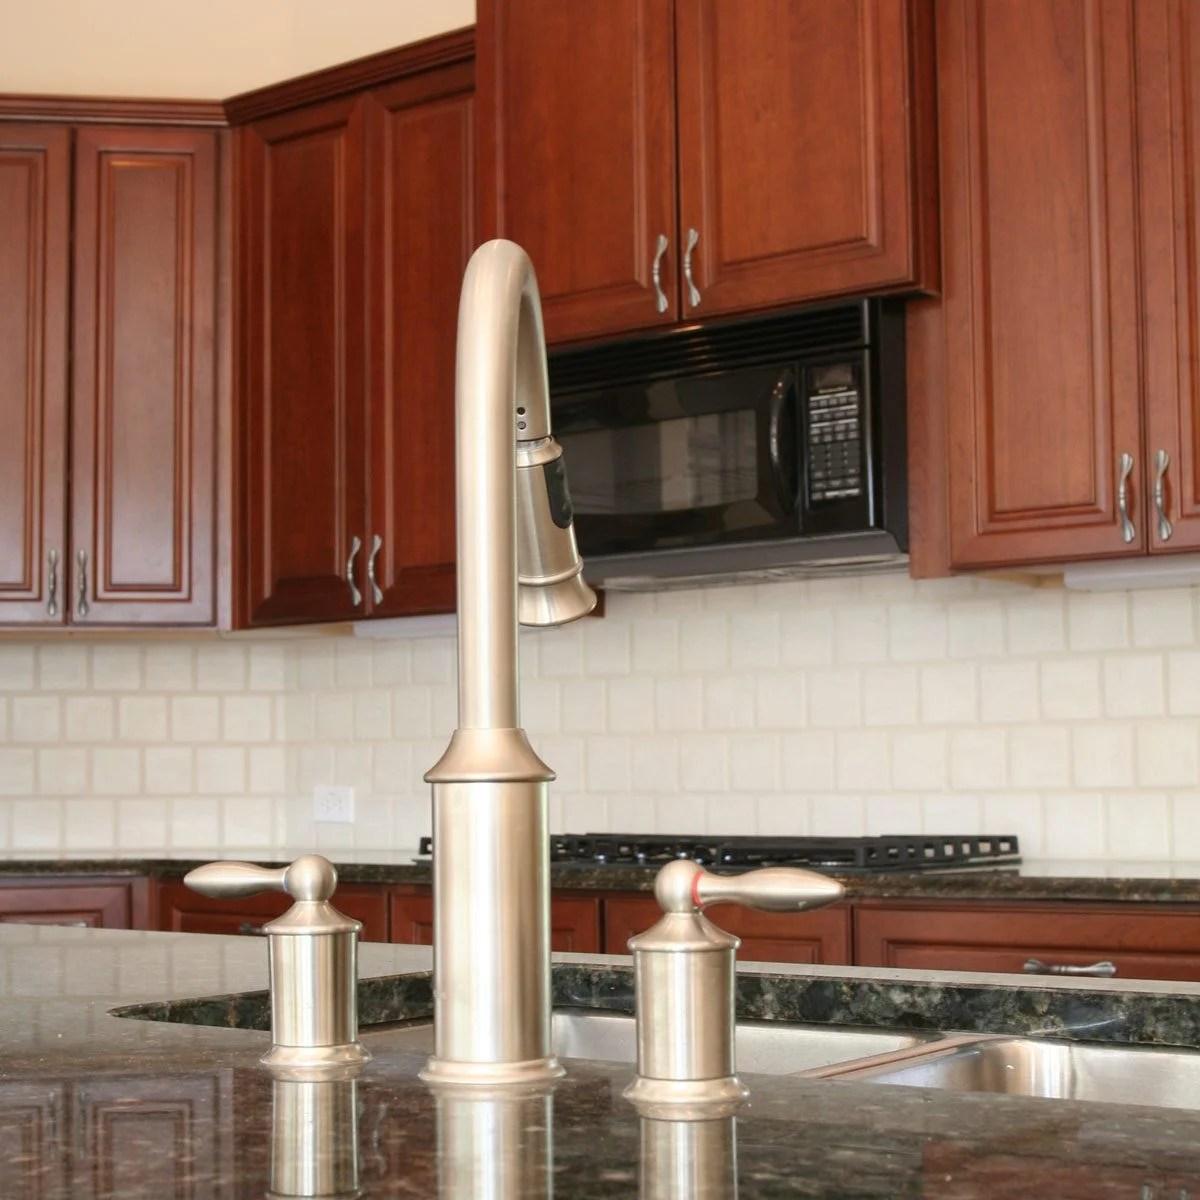 Best Kitchen Backsplash Ideas For Dark Cabinets | Family ... on Backsplash For Dark Countertops  id=53608